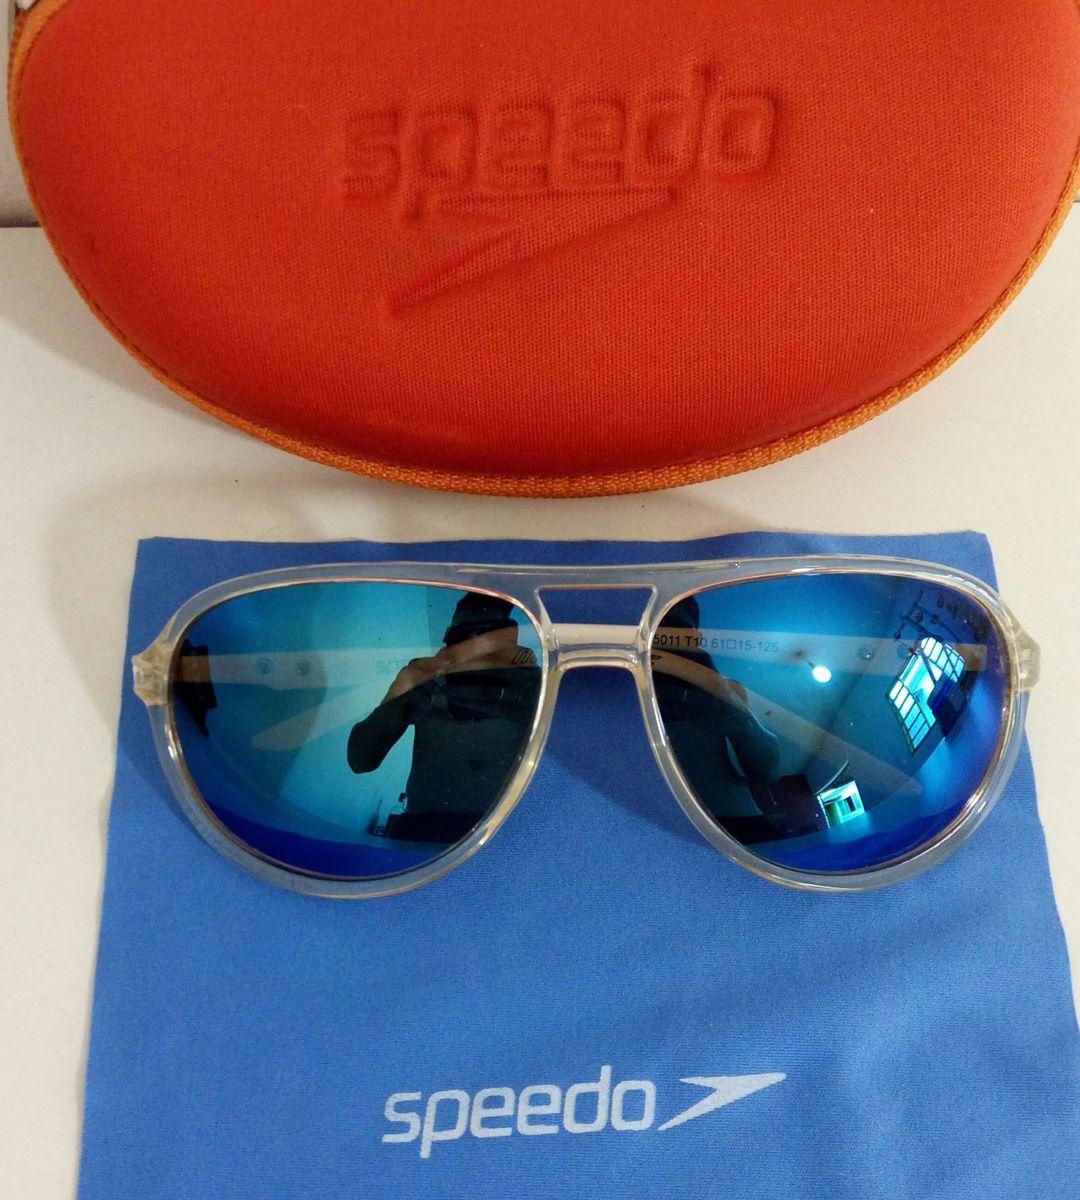 oculos solar speedo - óculos speedo.  Czm6ly9wag90b3muzw5qb2vplmnvbs5ici9wcm9kdwn0cy83mzgxnda4l2q2mza4y2zimmrjzwq4ntyxyjqzyzllmzk3nwq1yzdjlmpwzw c723c7ff69